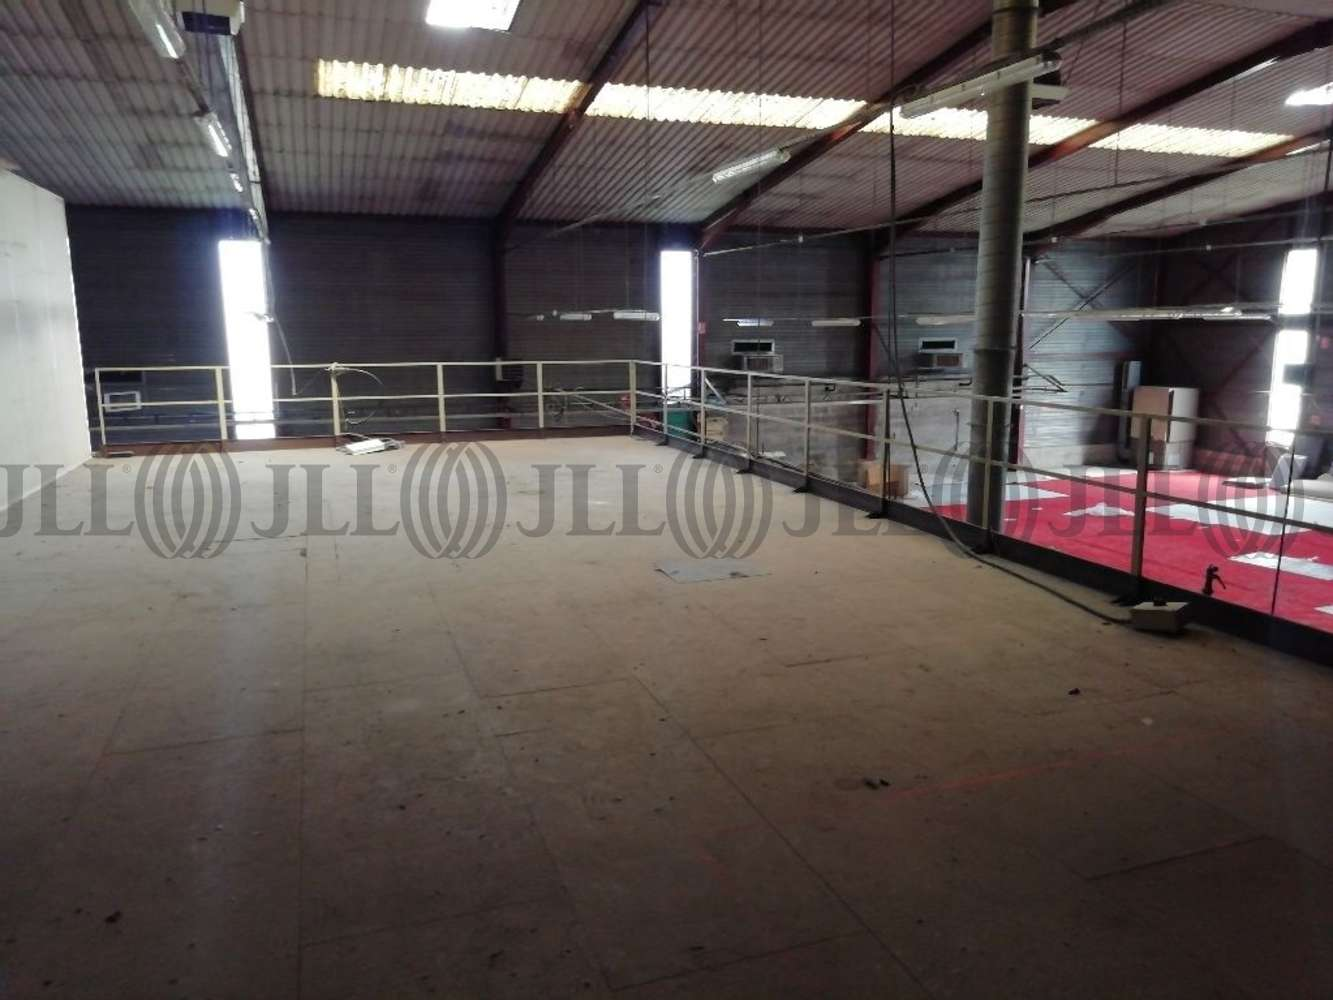 Activités/entrepôt Givors, 69700 - Location entrepot - Proche Lyon (69) - 10815331